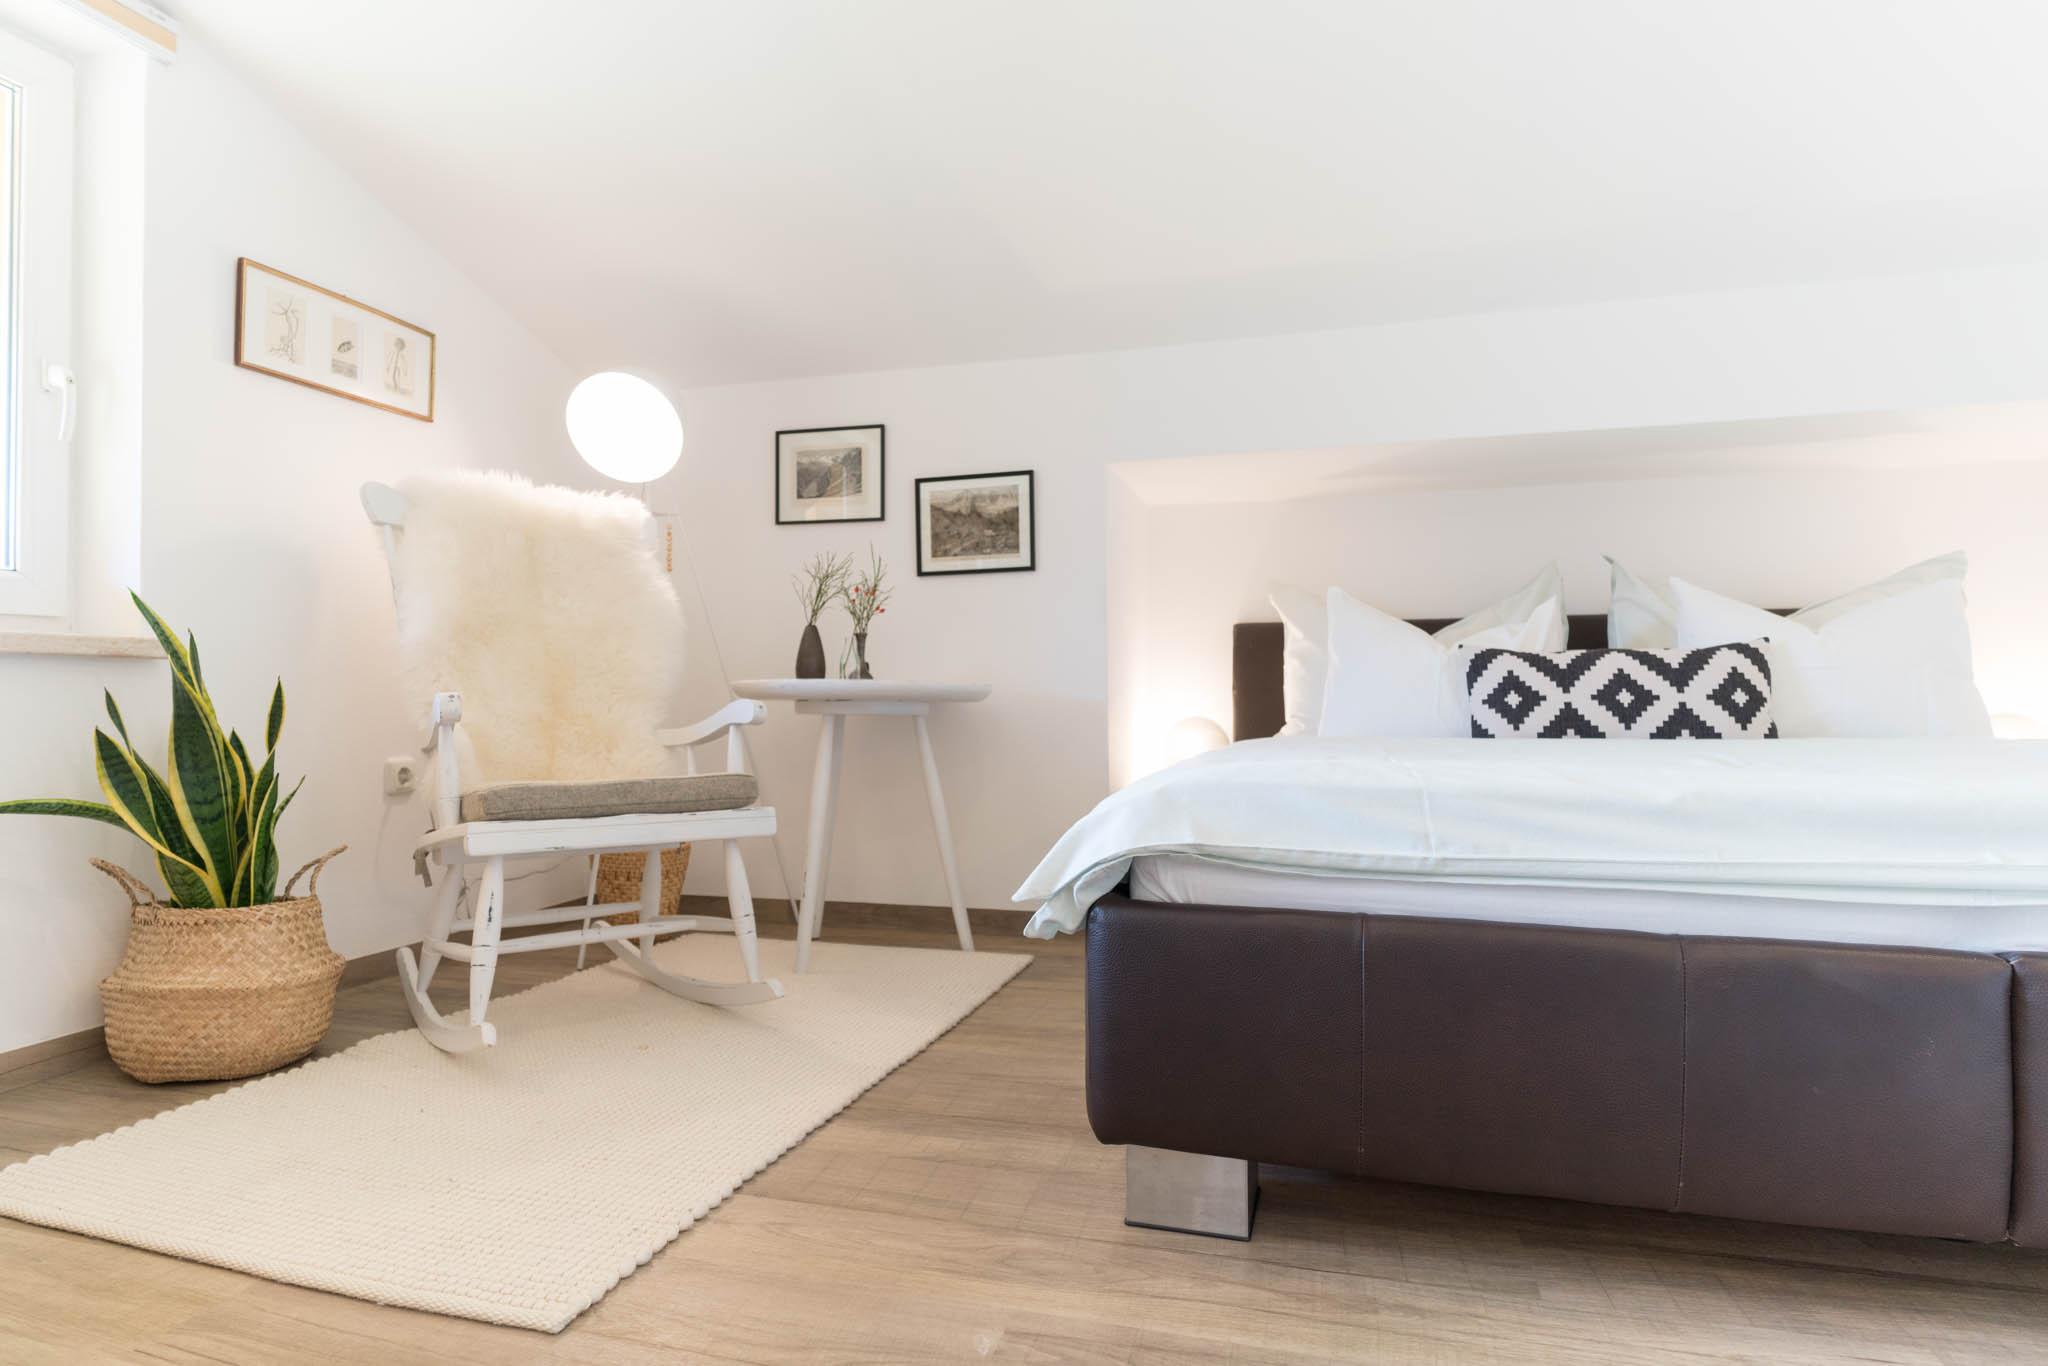 laerchmoos_appartement-c-15